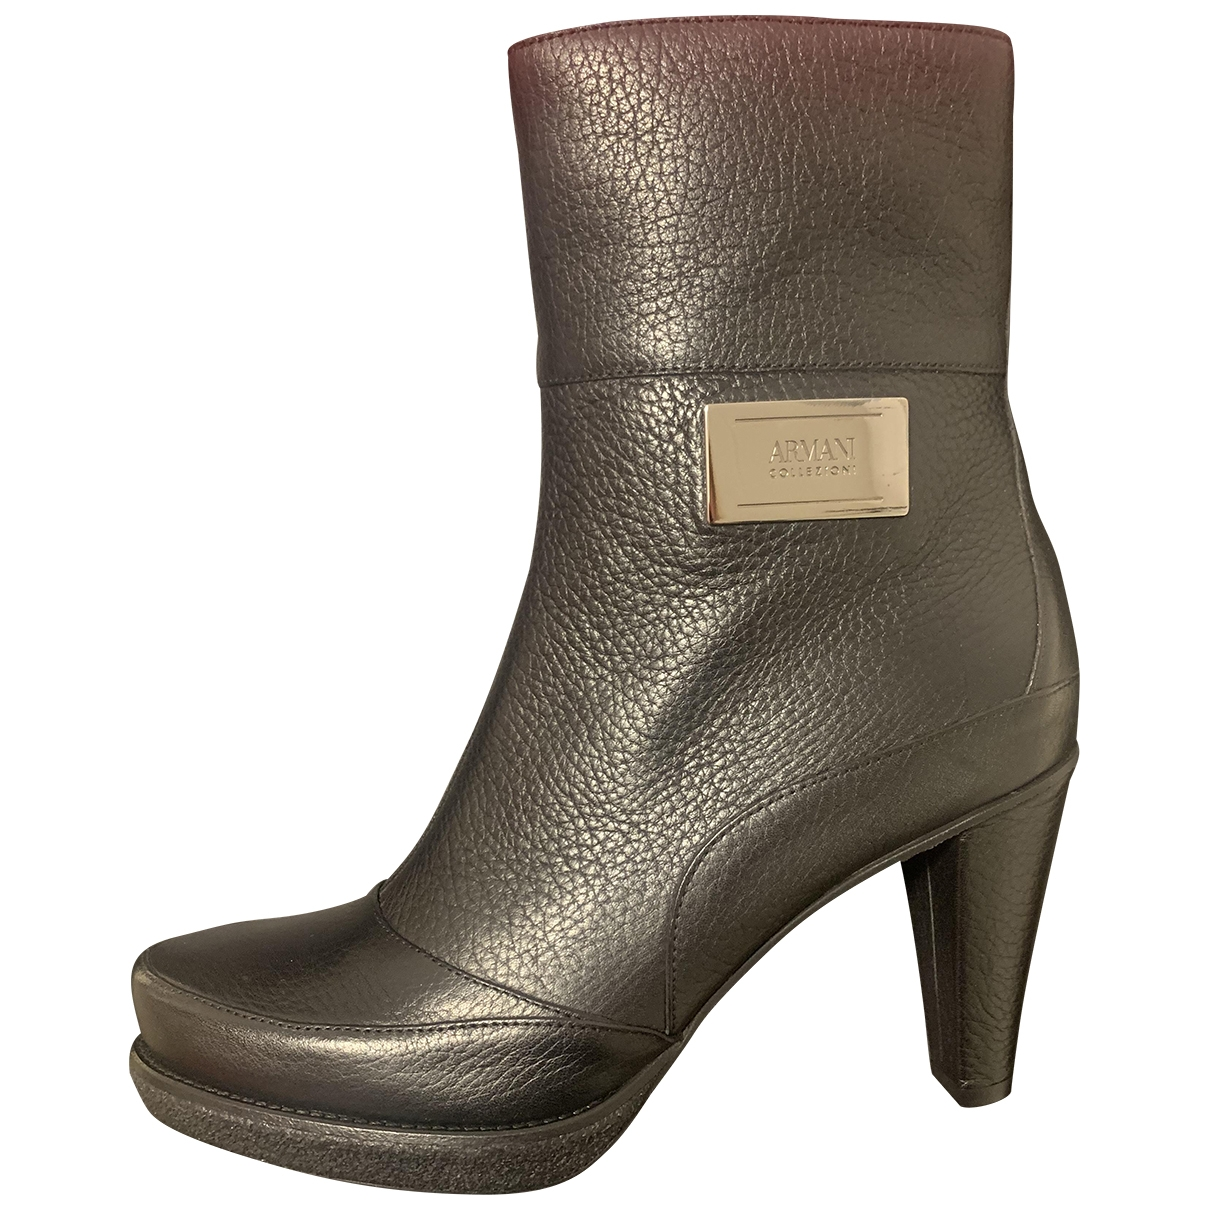 Armani Collezioni \N Black Leather Ankle boots for Women 39 EU